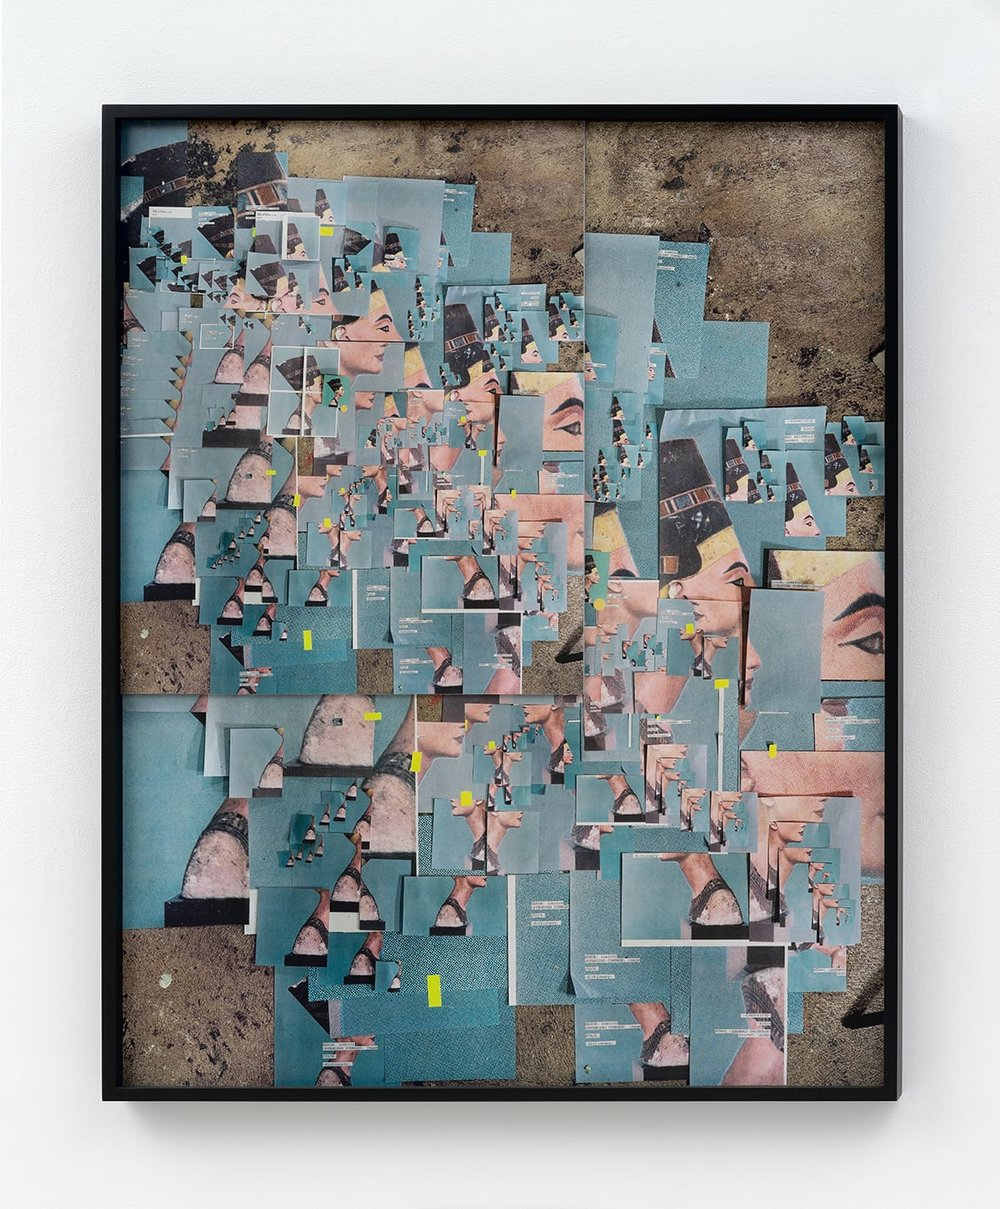 Sara Cwynar,  432 Photographs of Nefertit i, (2015), Collaged UV coated archival pigment prints mounted to Plexiglas and Dibond, 54 × 43 × 7/8 in.